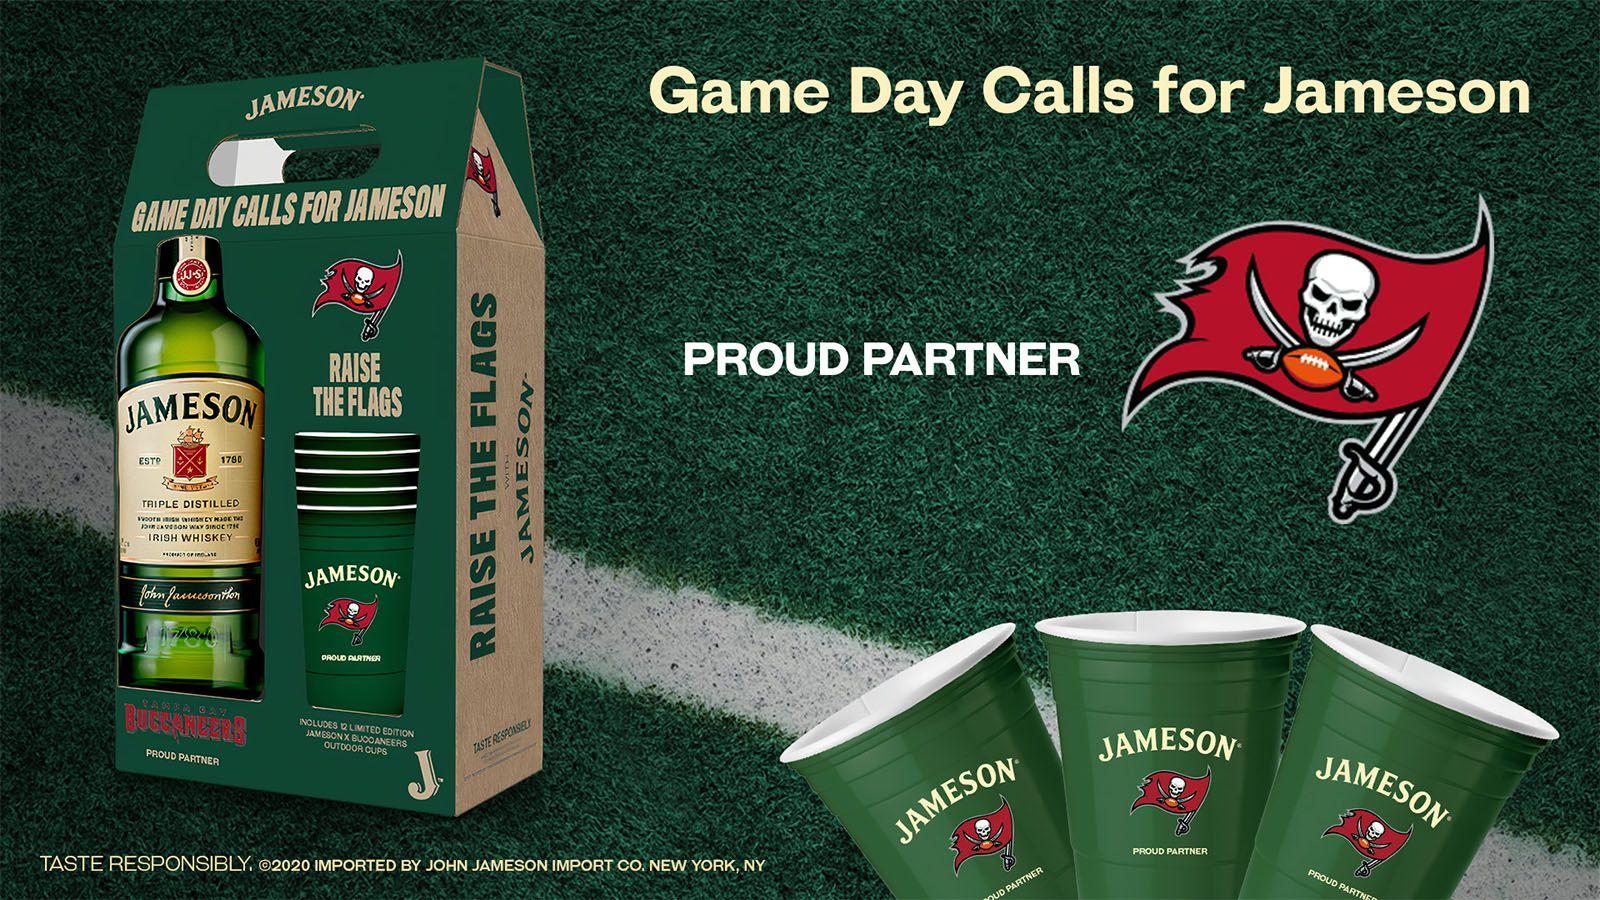 Gameday Calls for Jameson